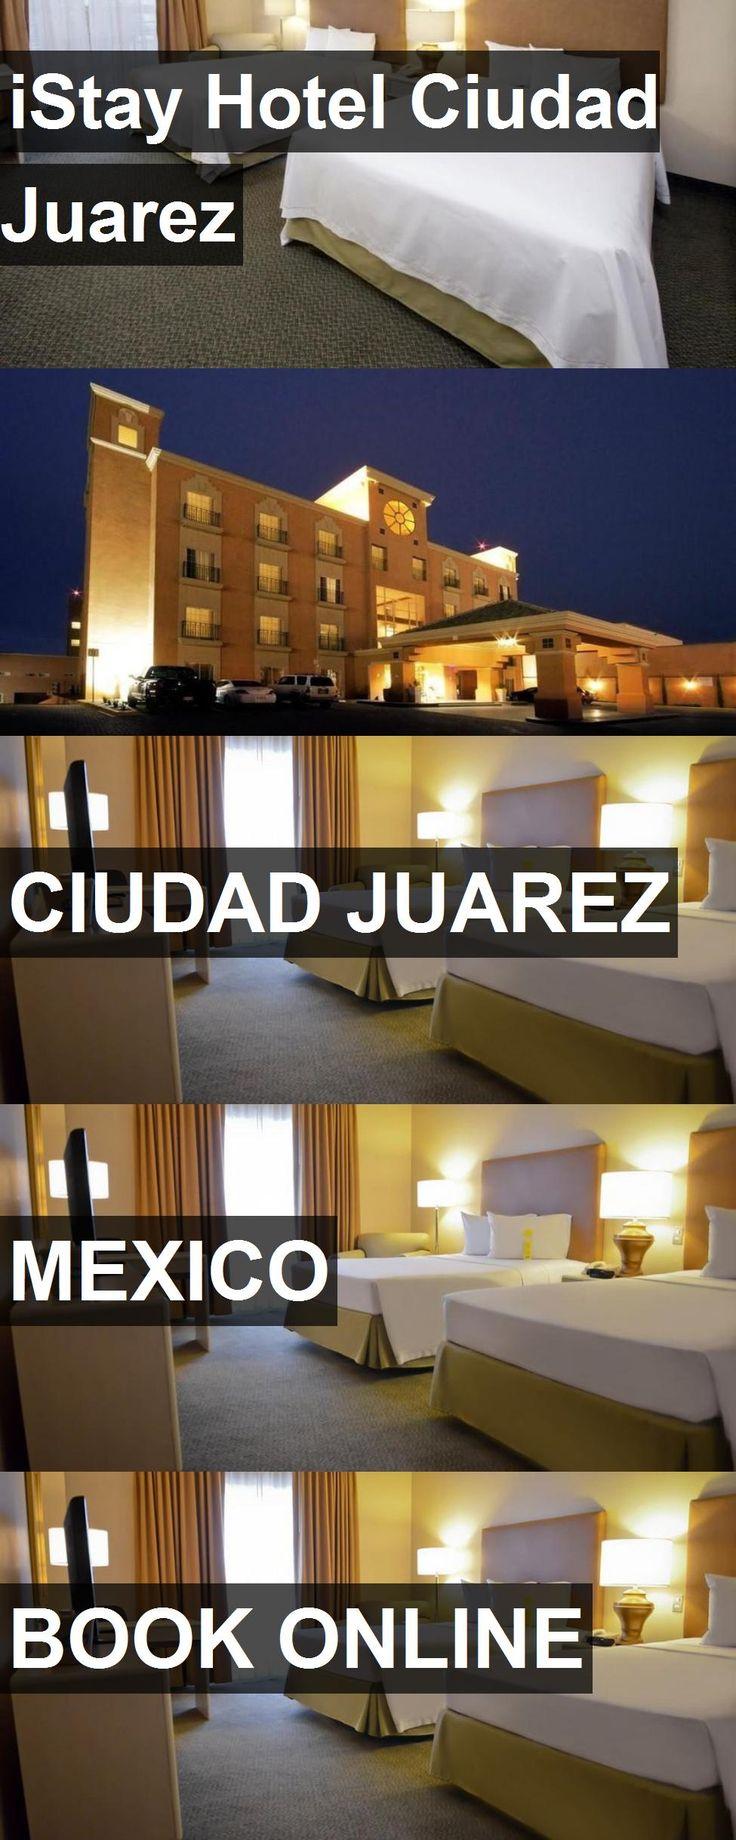 iStay Hotel Ciudad Juarez in Ciudad Juarez, Mexico. For more information, photos, reviews and best prices please follow the link. #Mexico #CiudadJuarez #travel #vacation #hotel